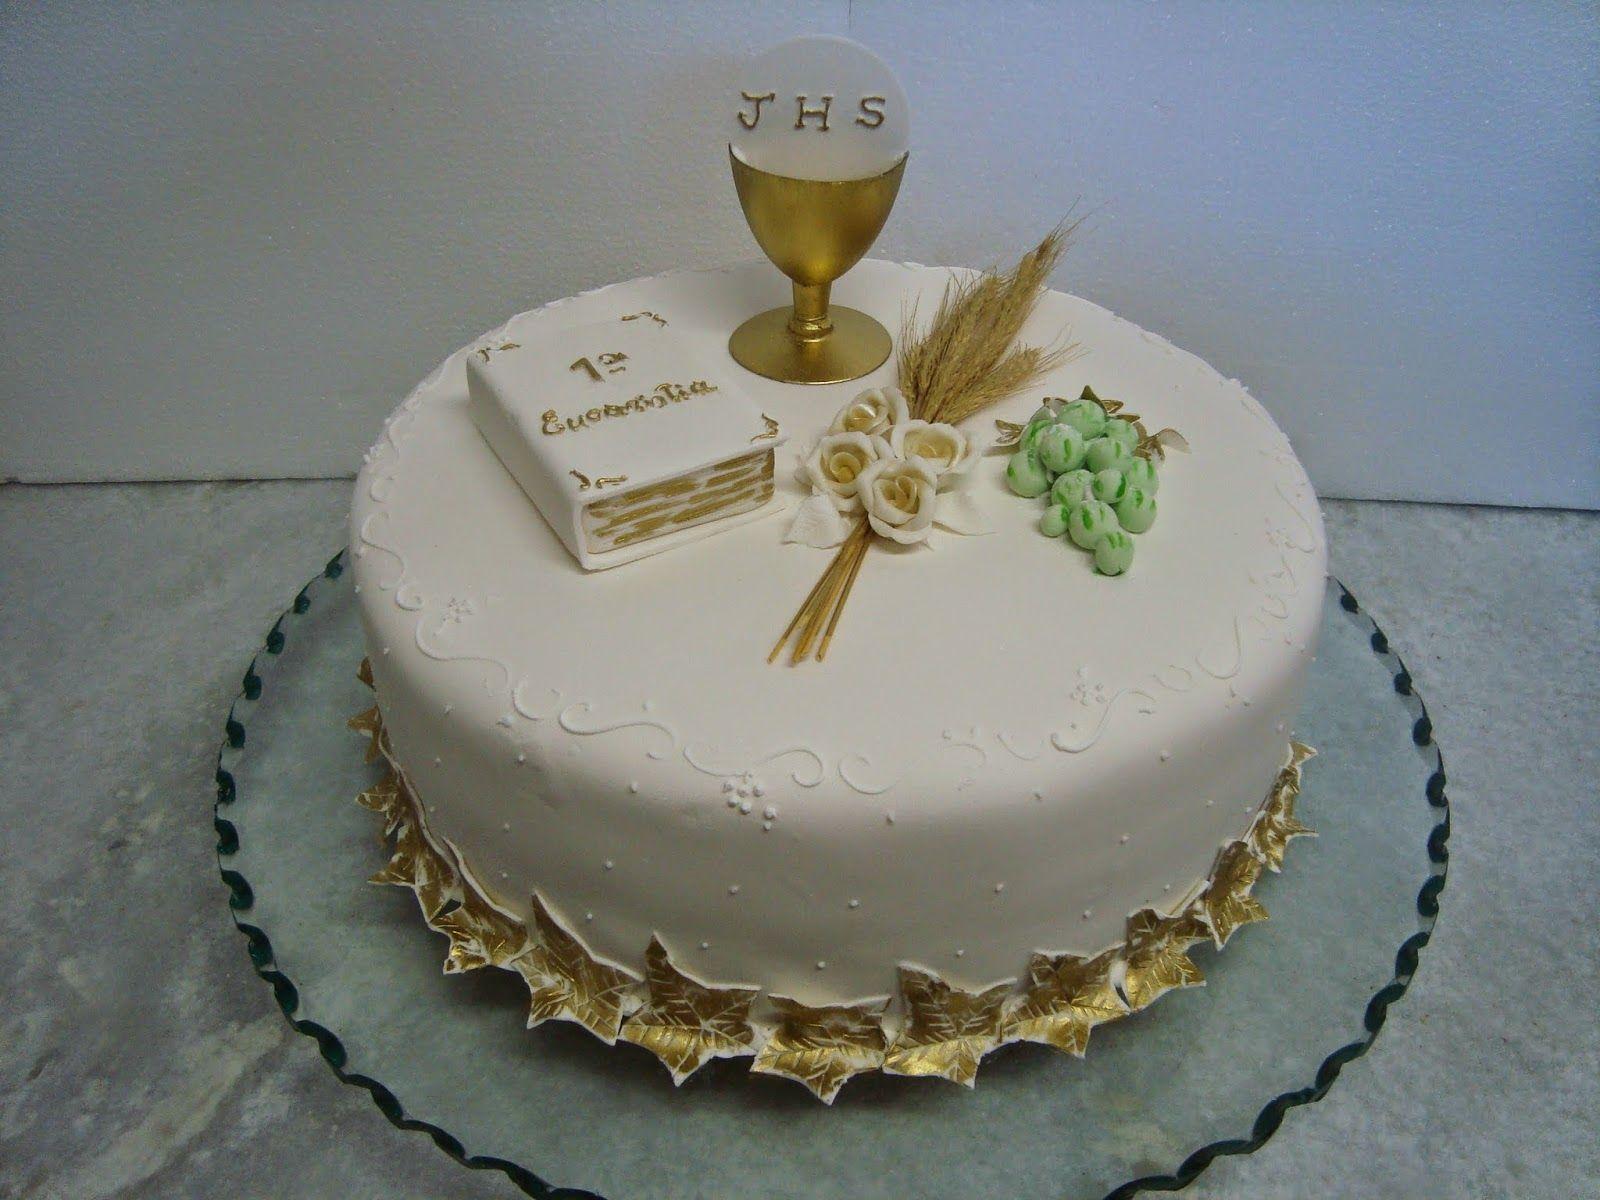 bolo de primeira eucaristia em fortaleza Pesquisa Google Bolos de Primeira Eucaristia